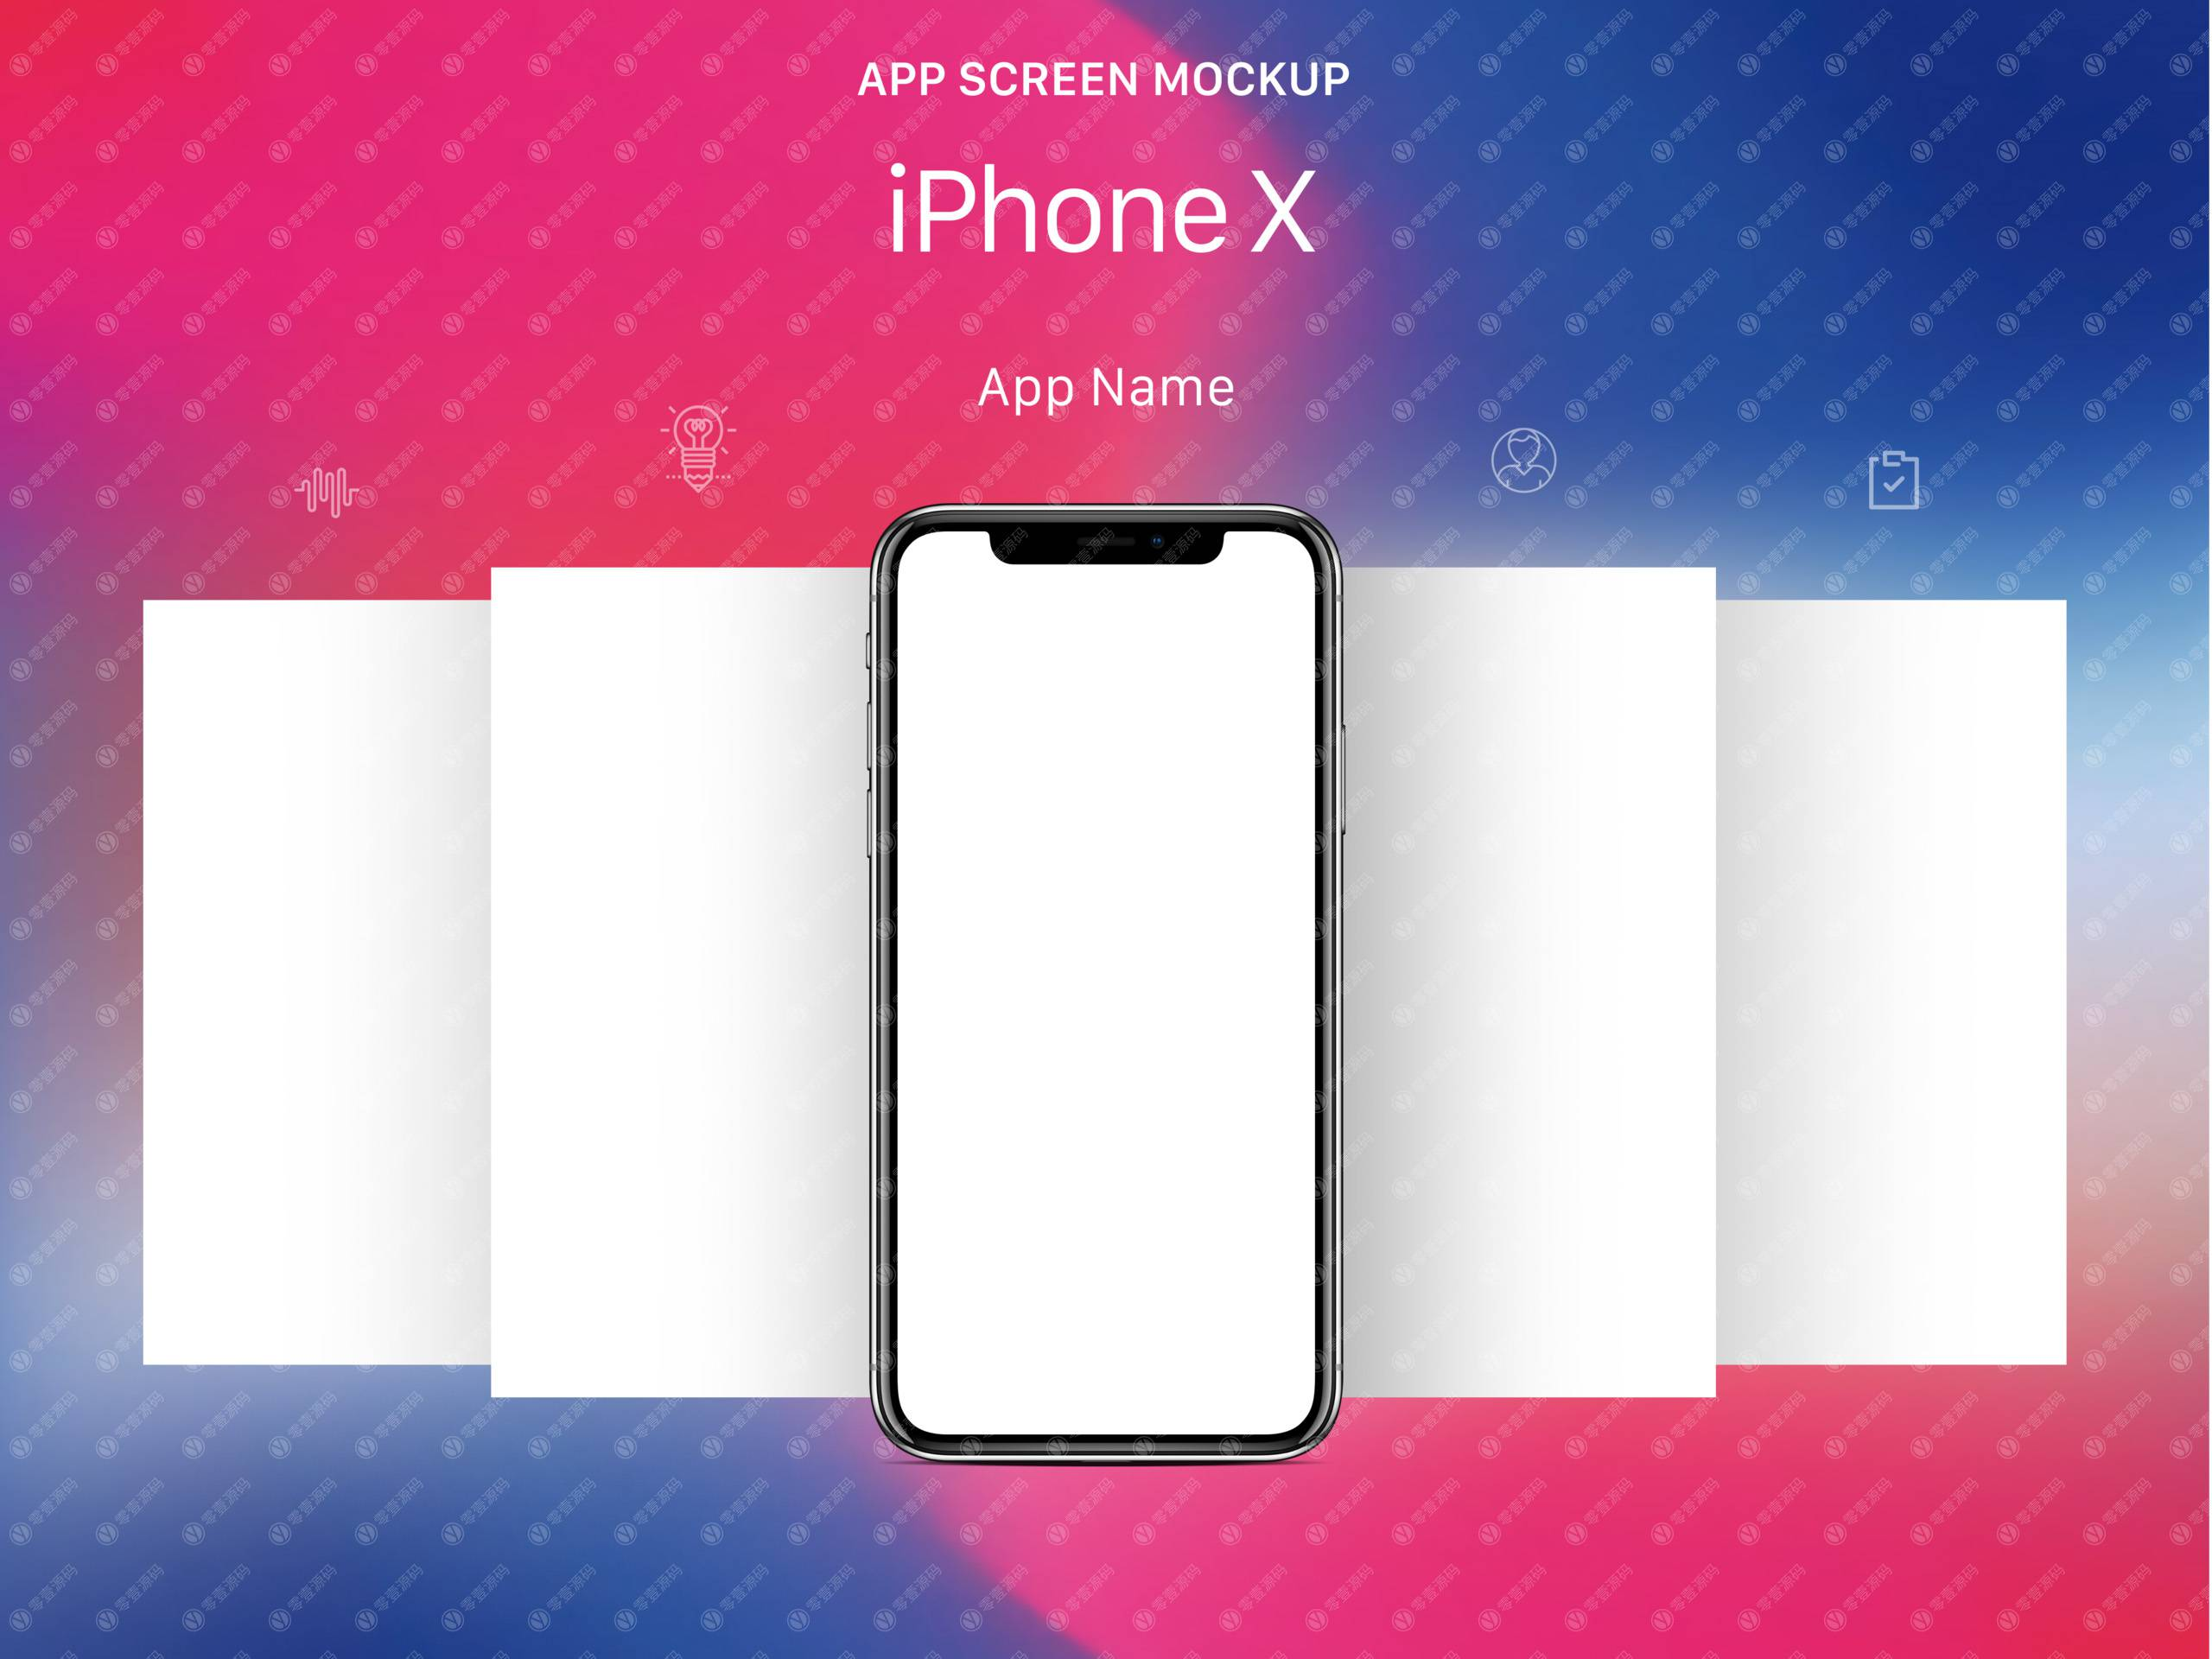 iPhoneX Mockups 苹果X手机样机组合模型素材psd源文件